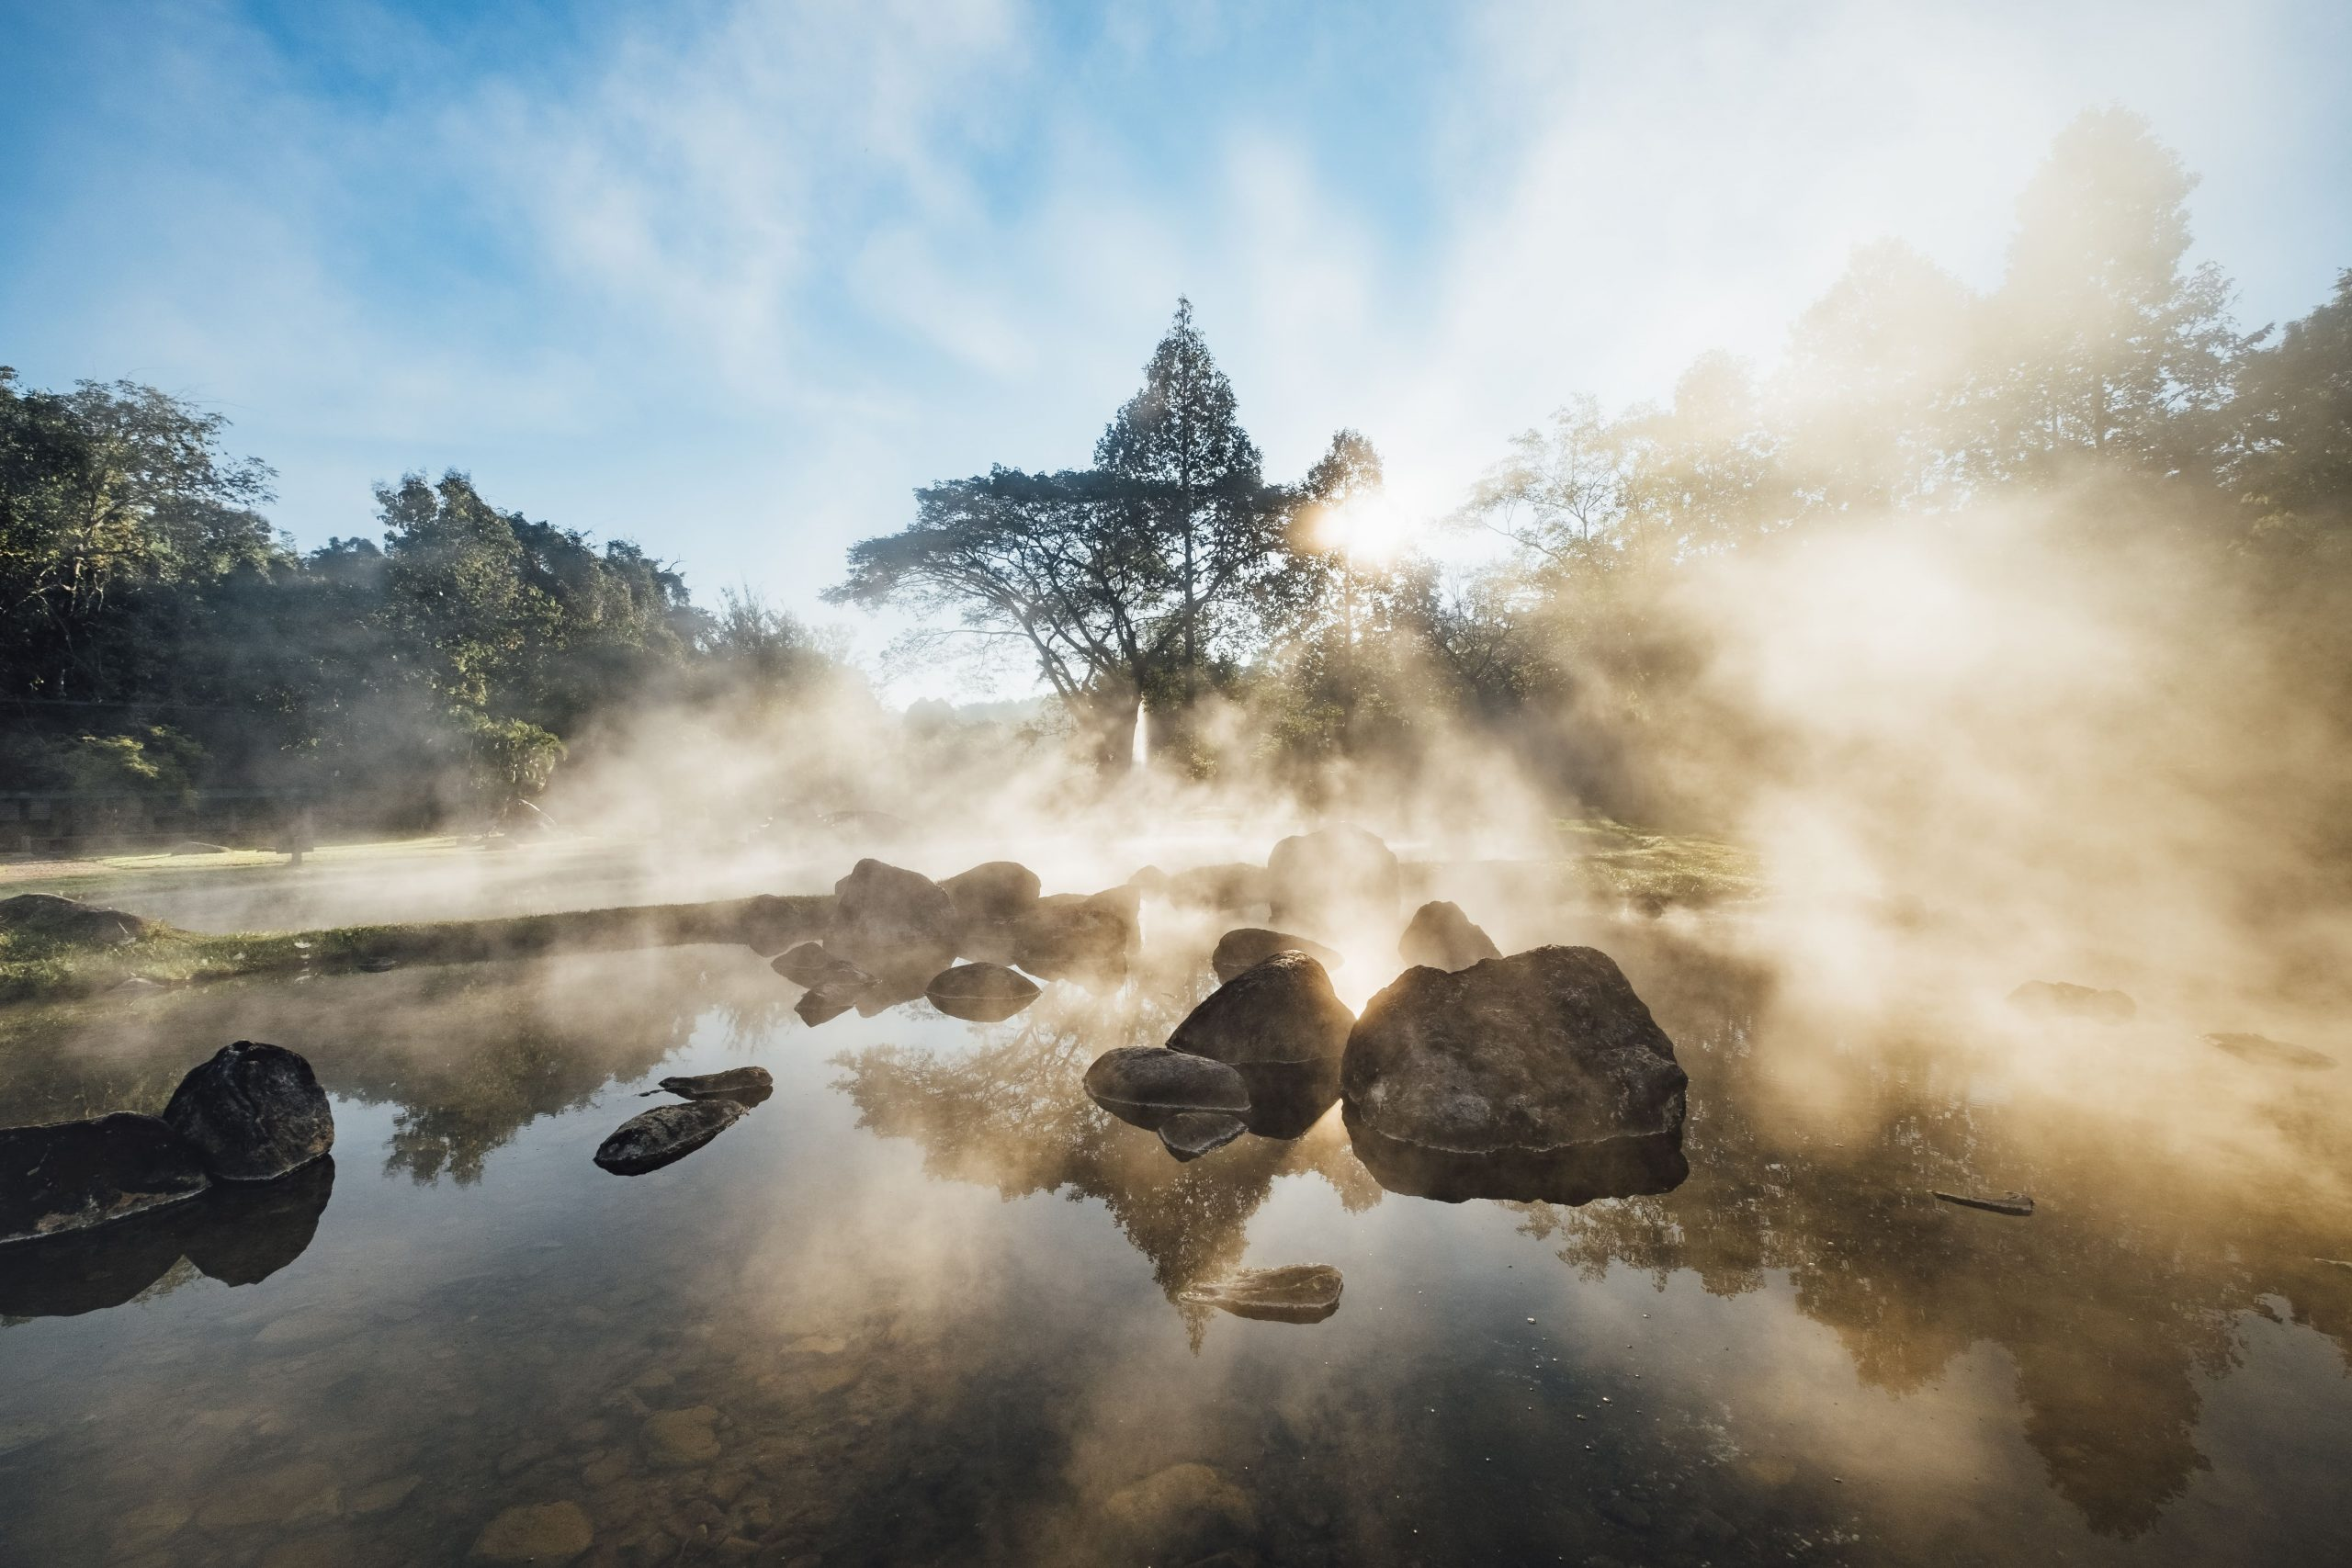 Borneo Nature Foundation: Protecting Borneo's biodiversity